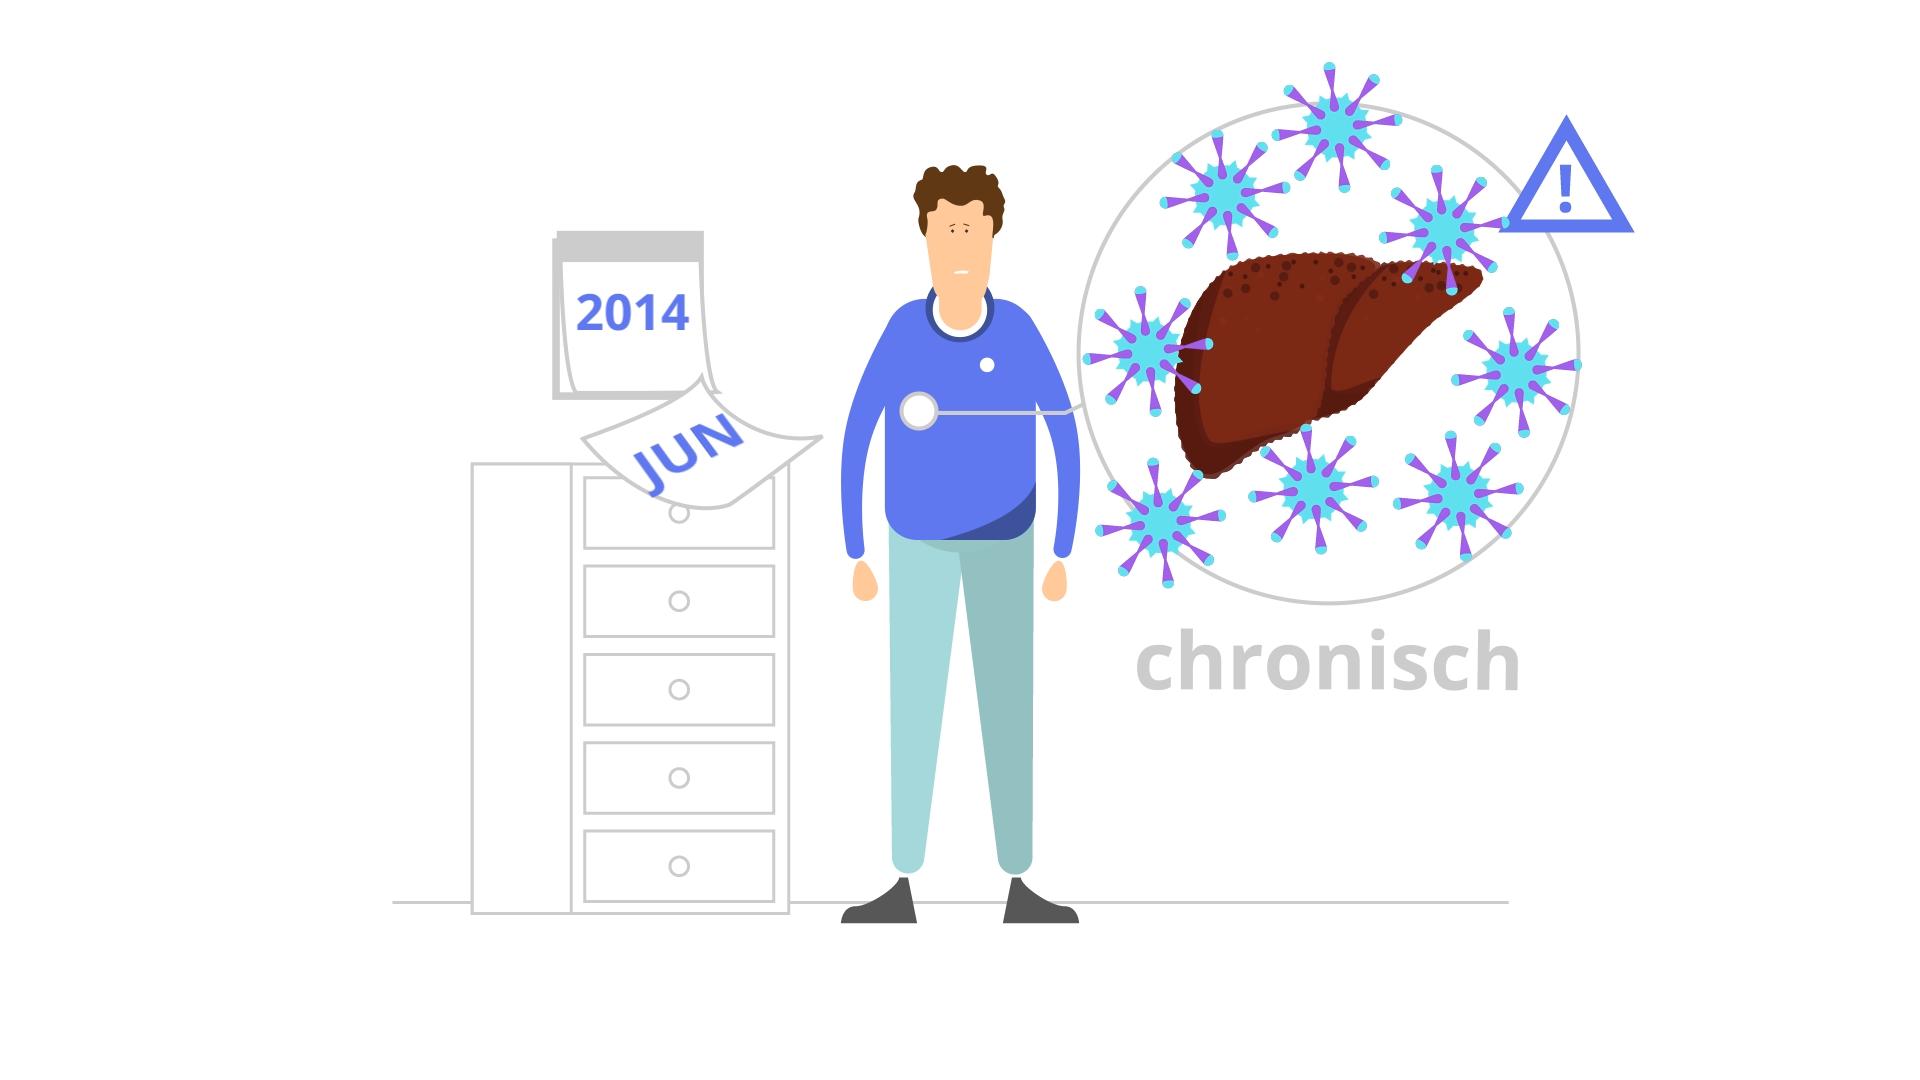 hepatitis-c-verlauf-chronisch